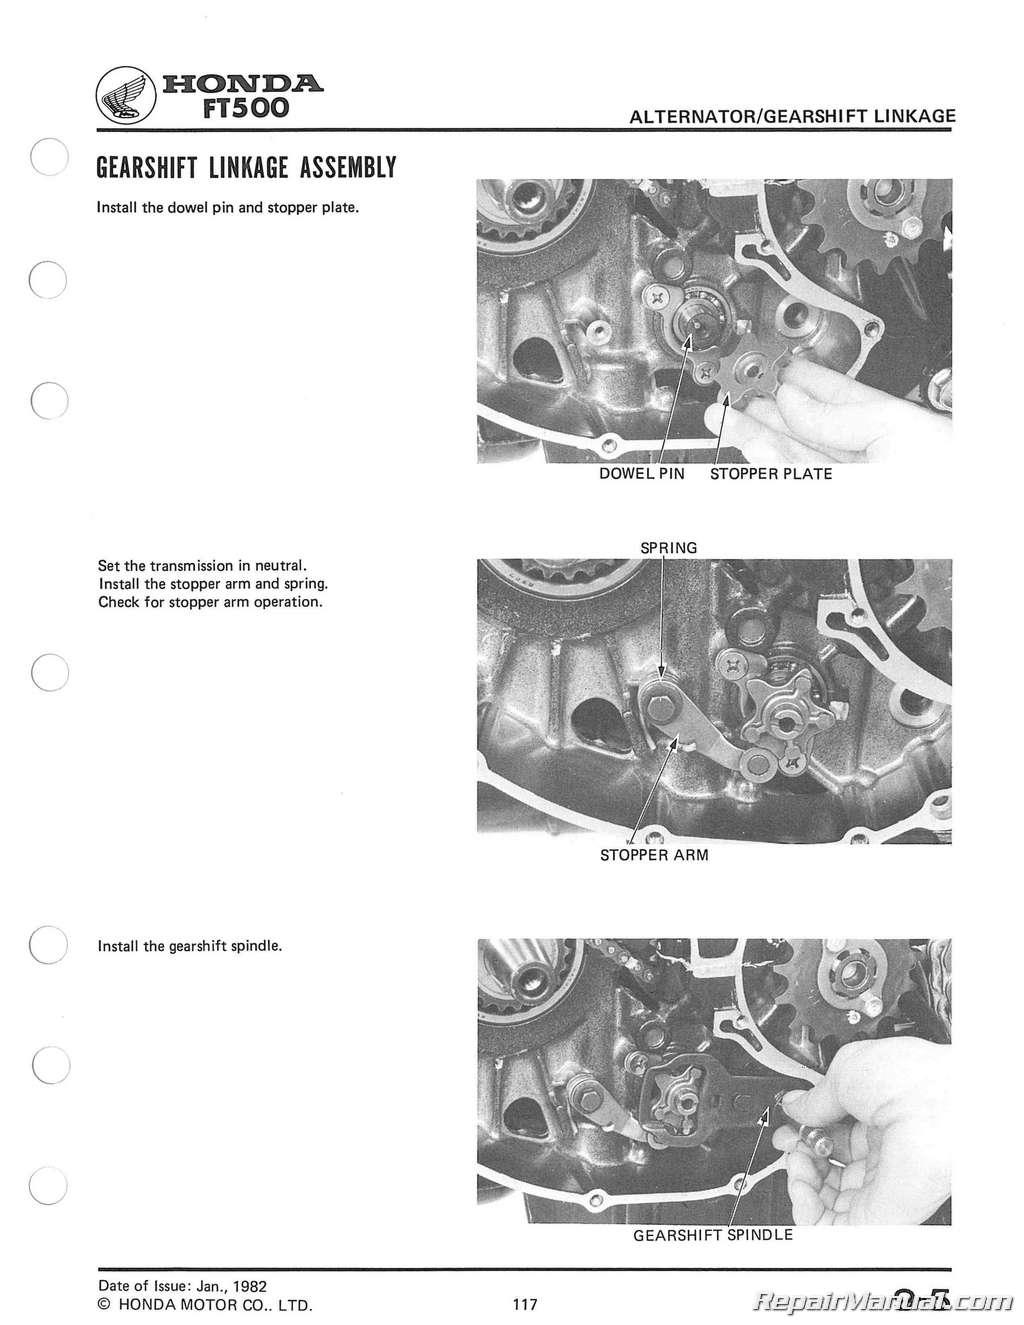 Honda Ft500 Ascot Motorcycle Service Manual